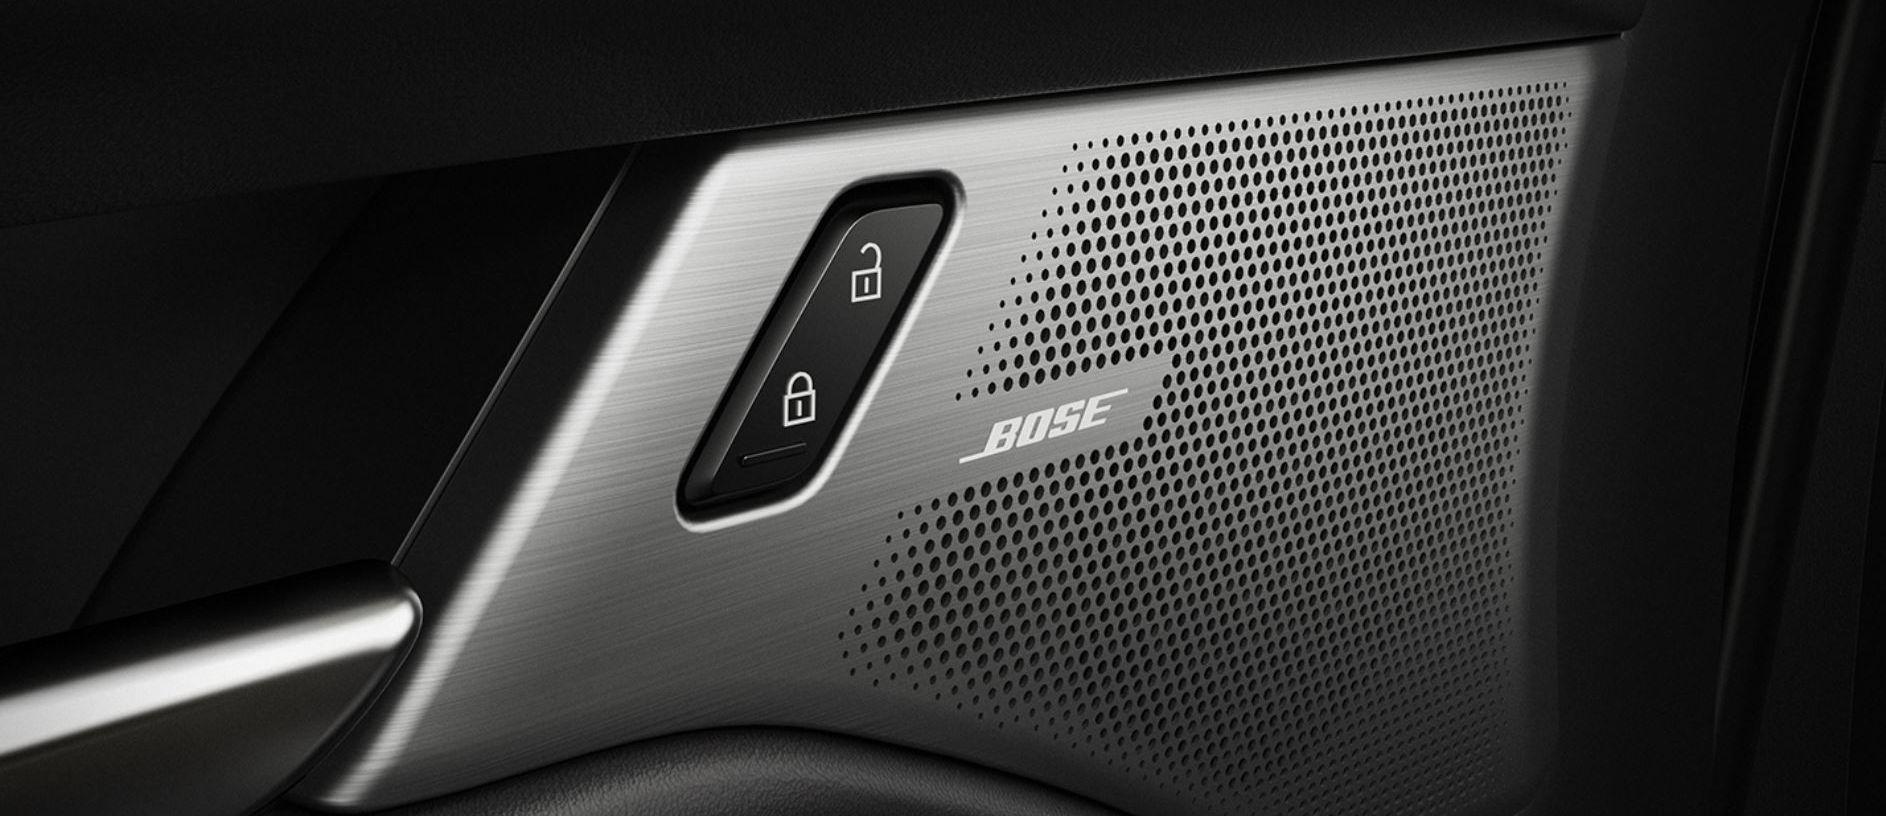 2019 Mazda3 Sedan Interior Detailing